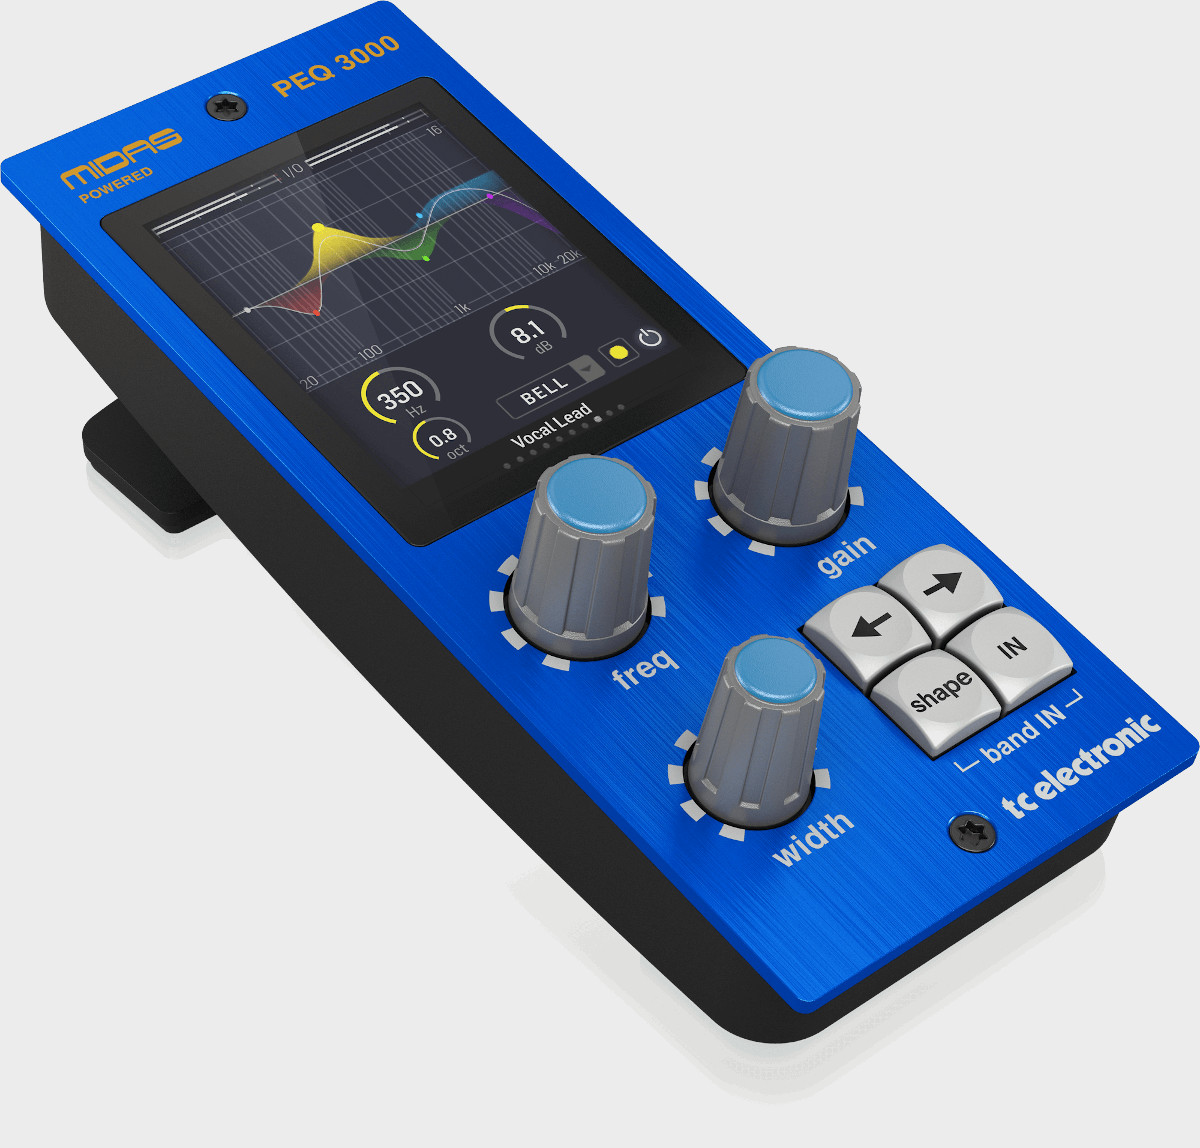 TC ELECTRONIC PEQ 3000 NATIVE PEQ 3000-DT CONTROLLER MIDAS HERITAGE 3000 EQ 1